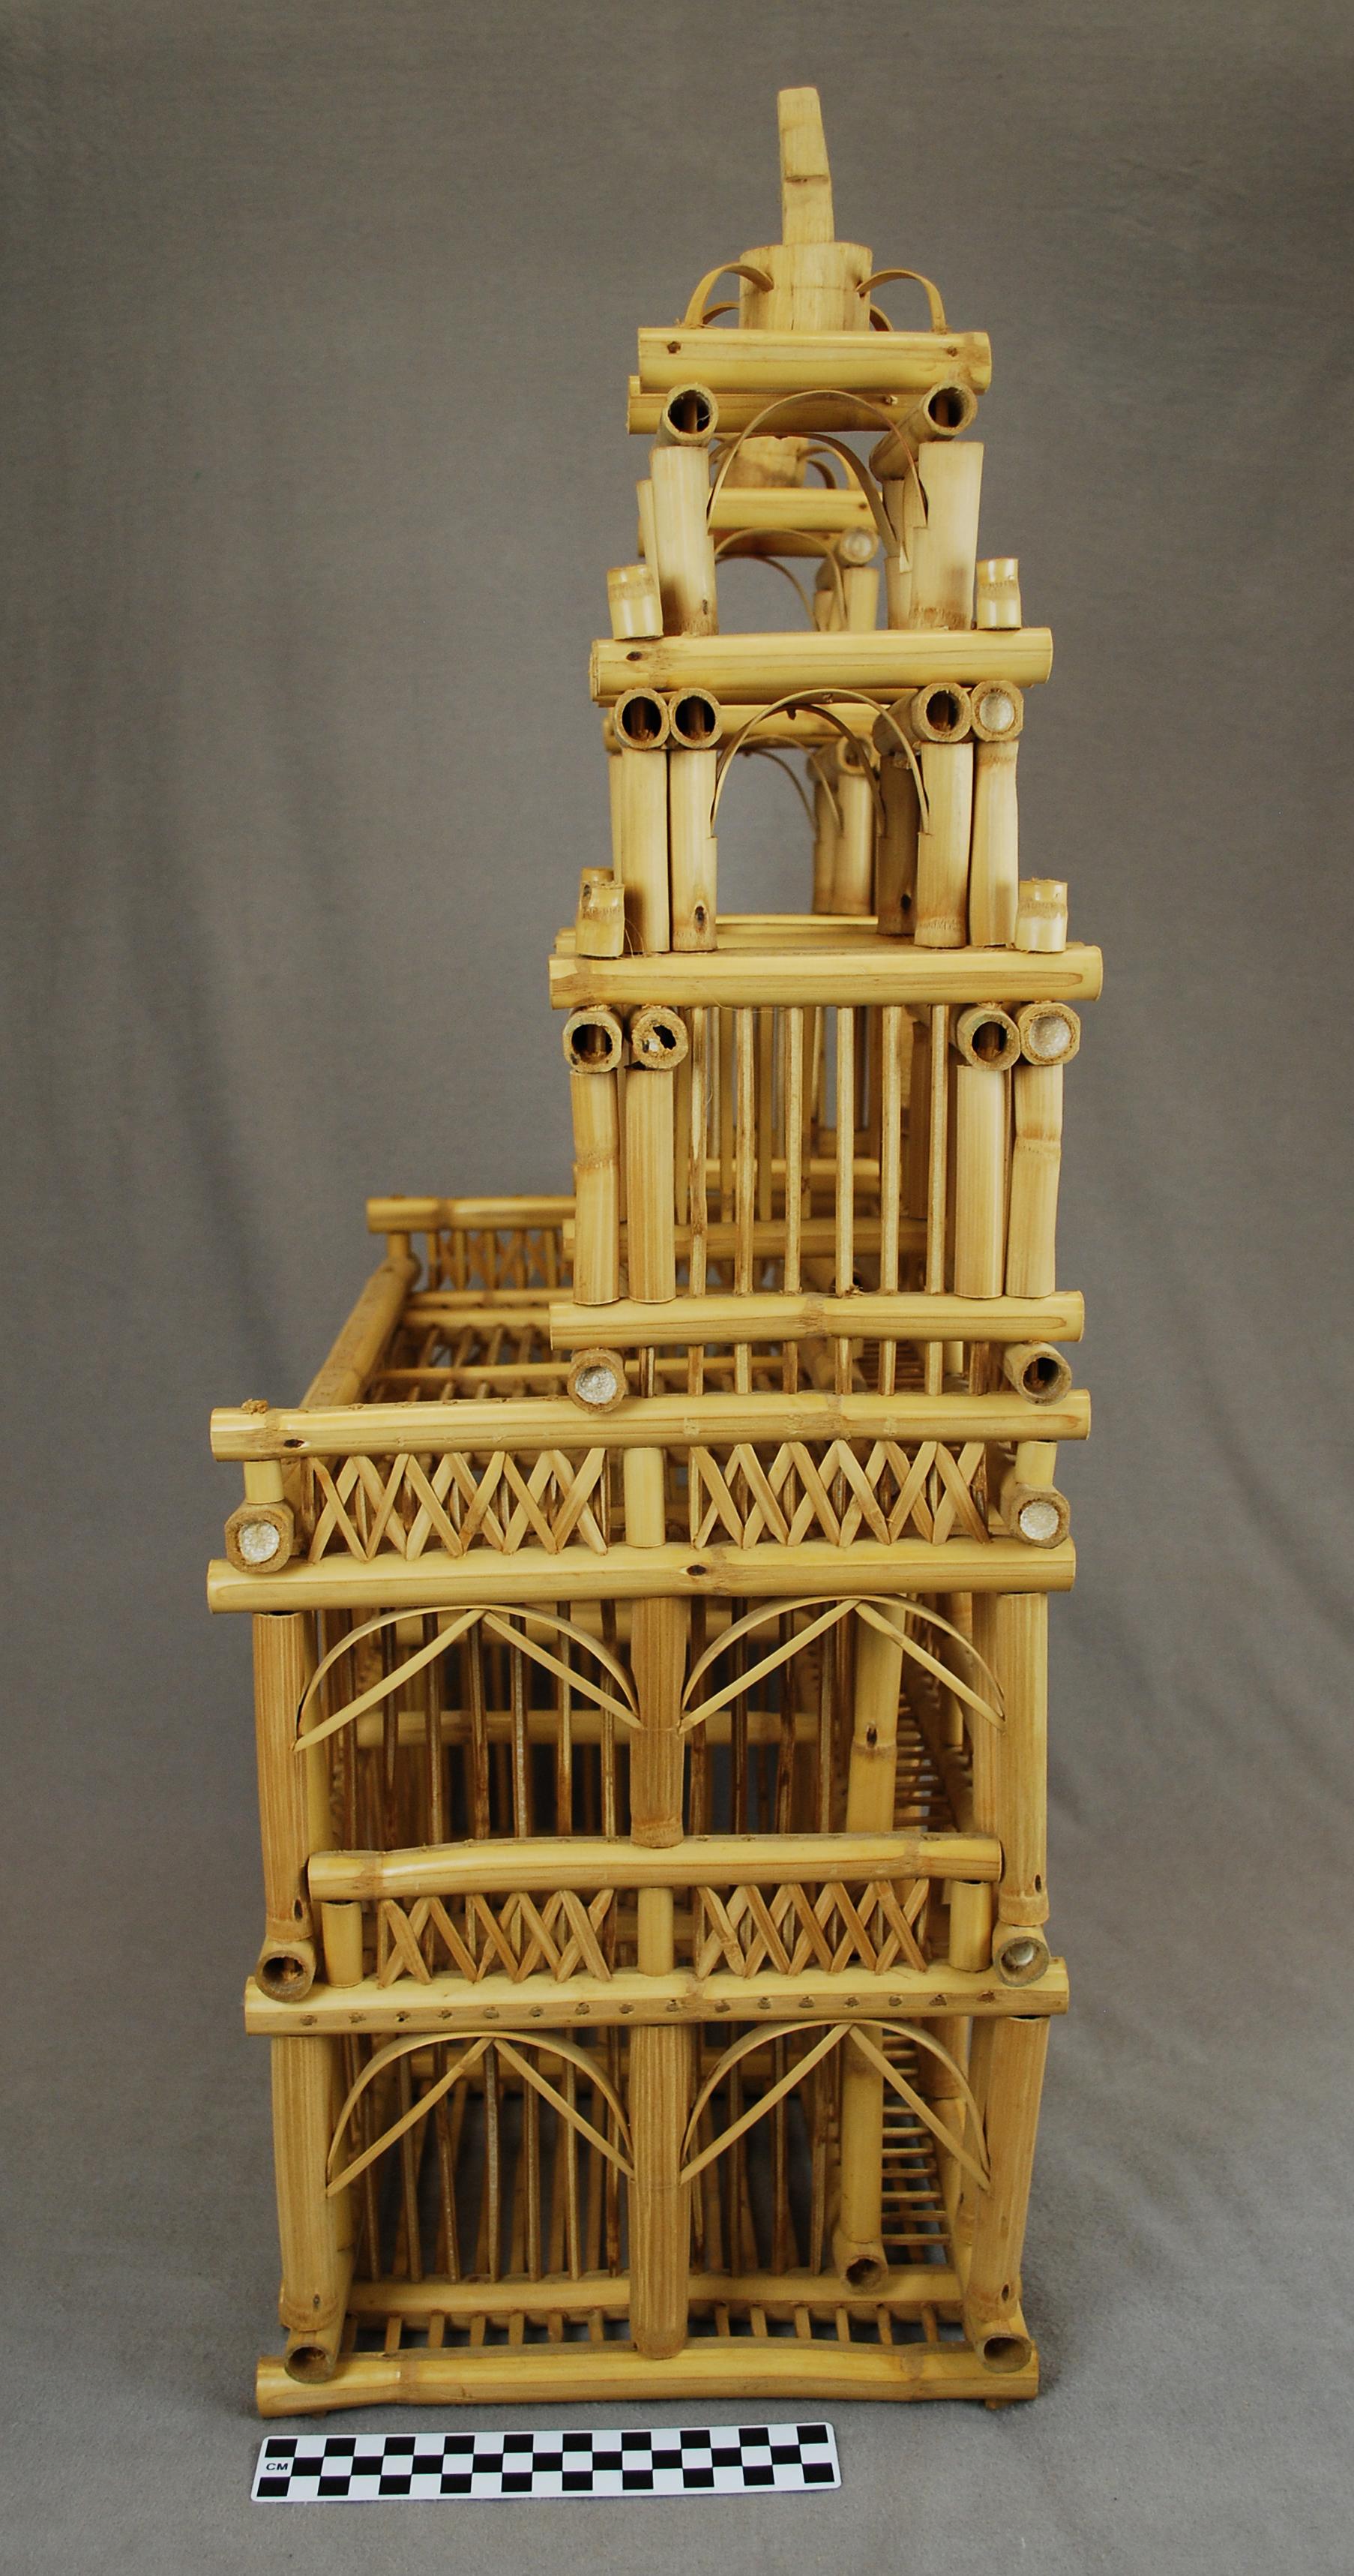 Object: Birdcage | UTSA Institute Of Texan Cultures